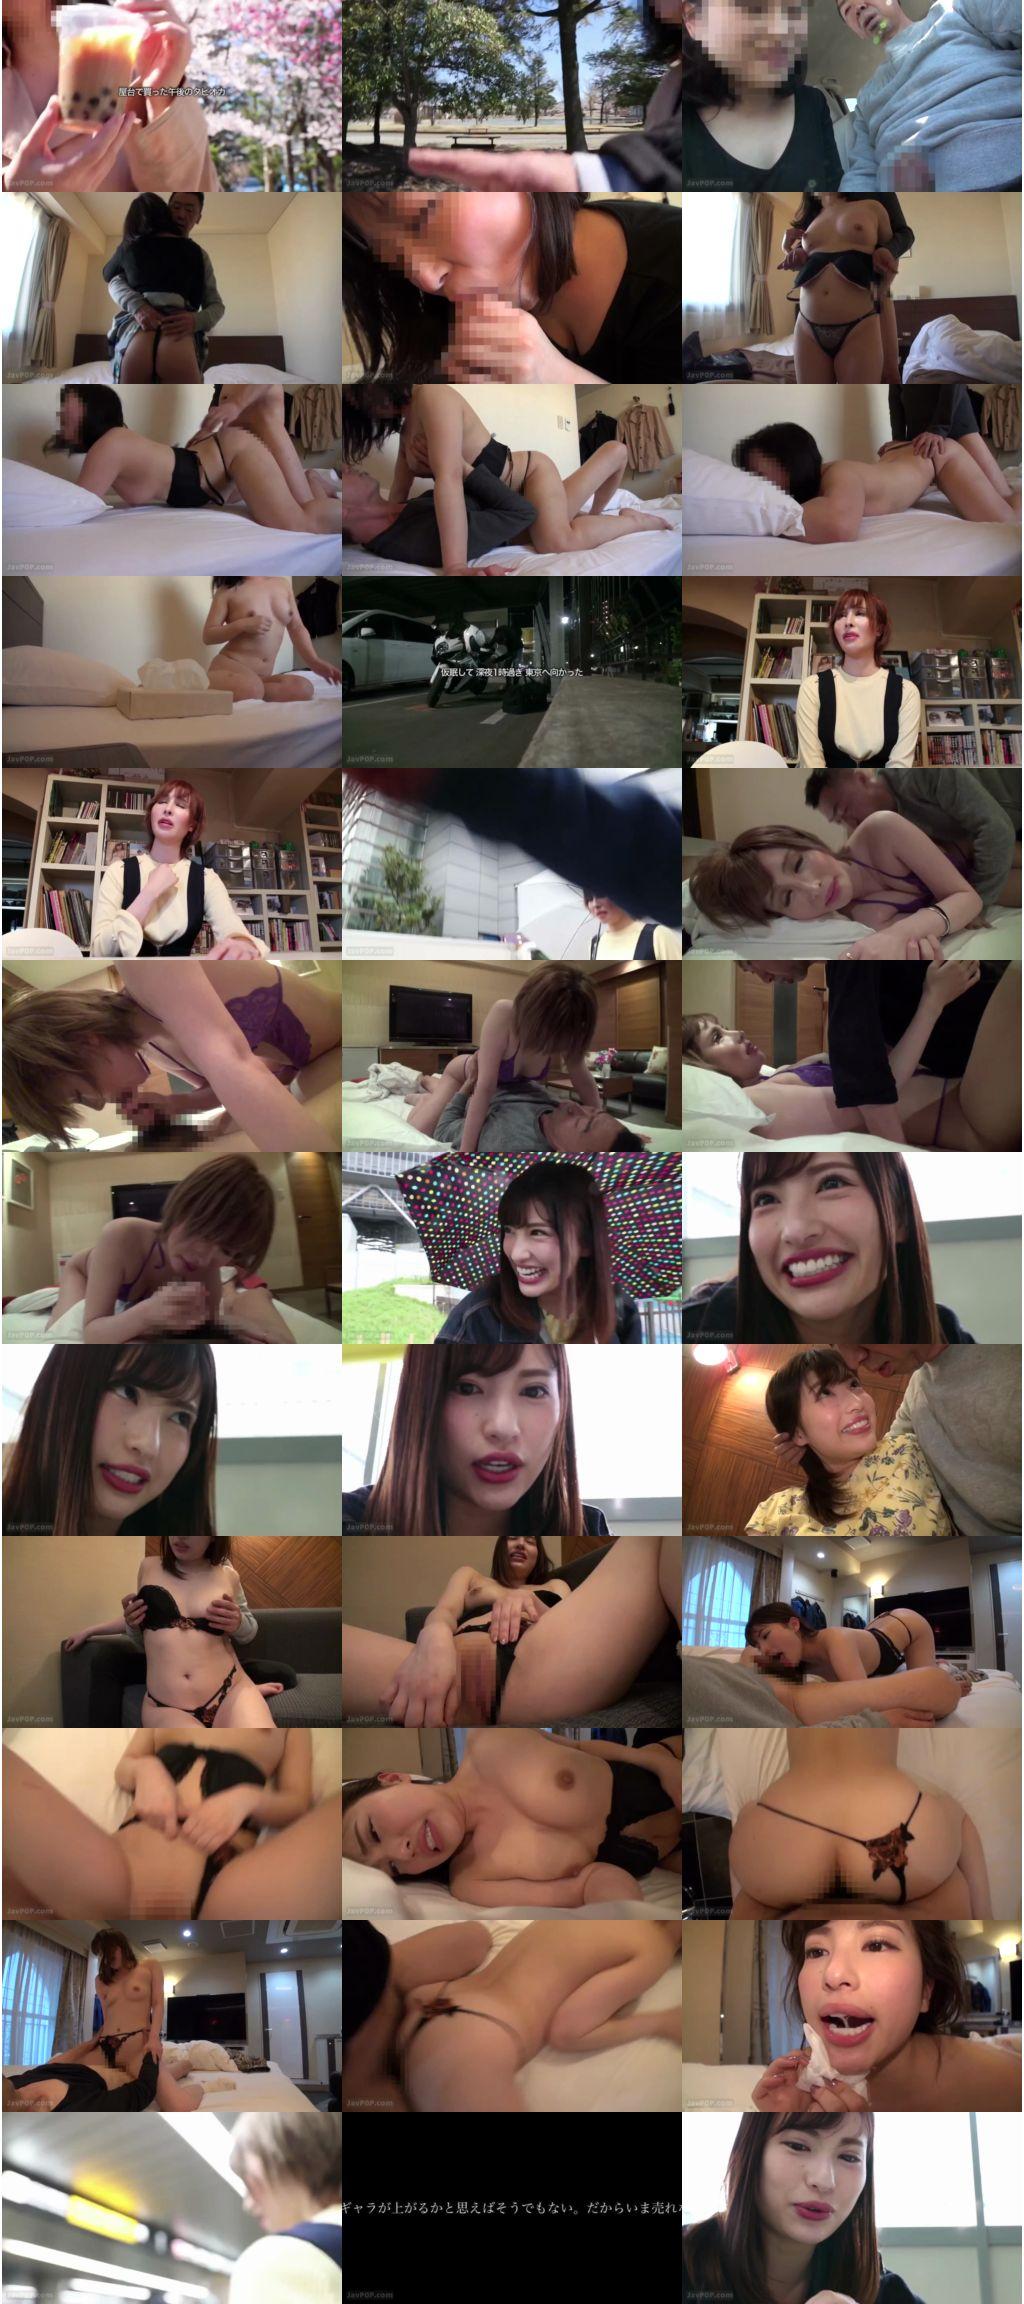 hmnf 060 s - [HMNF-060] 私を女優にして下さい AGAIN 18 早川瑞希 Hayakawa Mizuki NON FICTION 早川瑞希 Non Fiction Big Tits